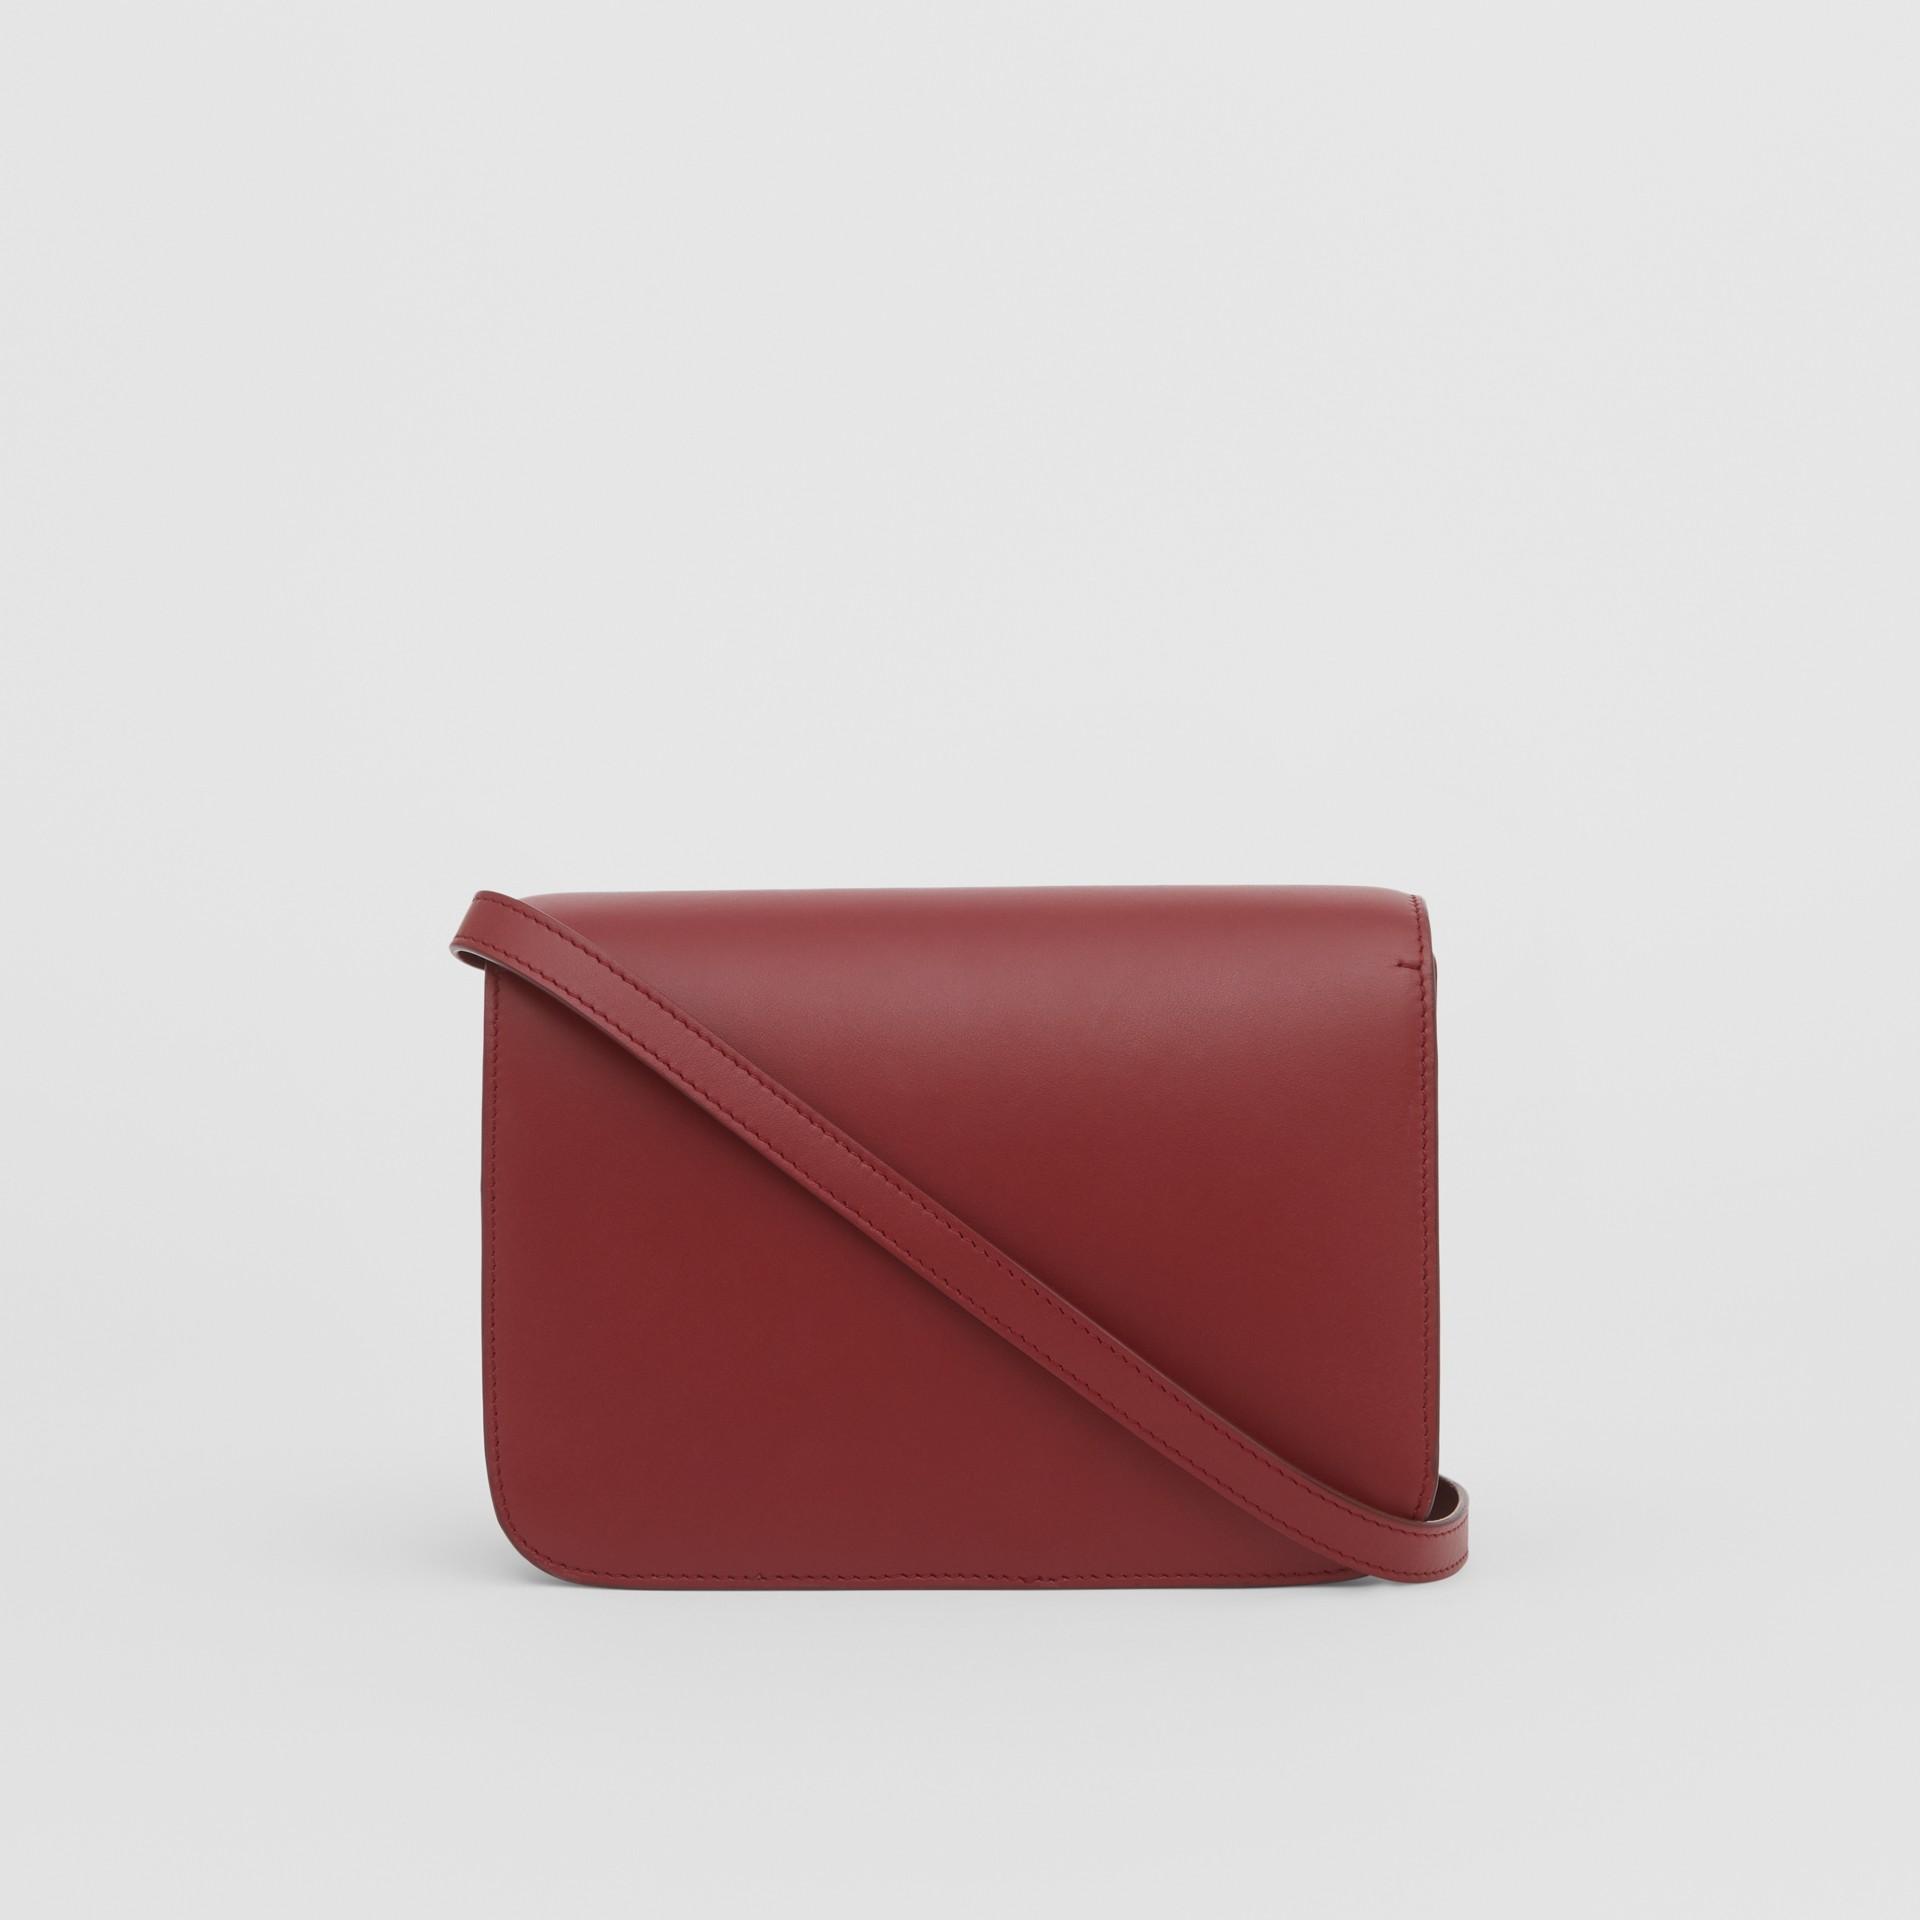 Small Leather TB Bag in Dark Crimson - Women   Burberry - gallery image 7